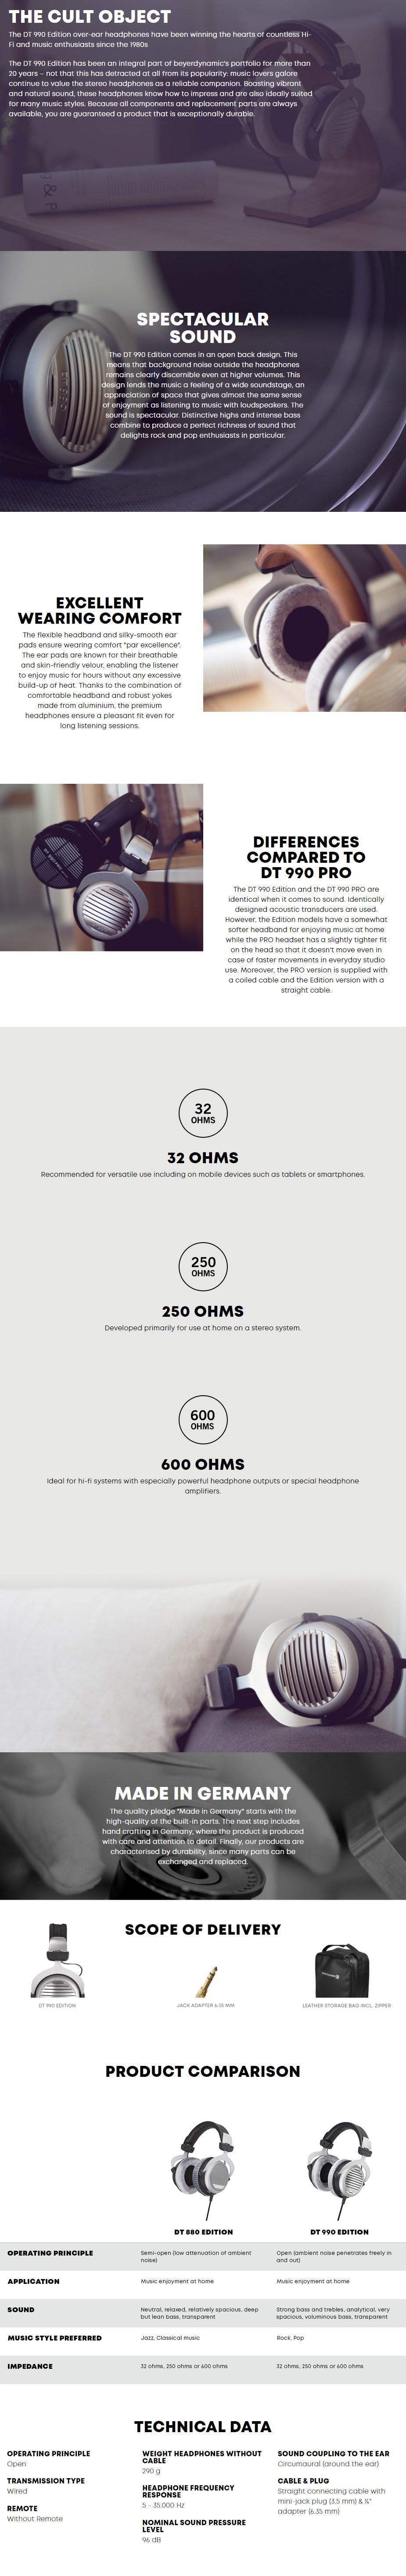 Beyerdynamic DT 990 Edition Semi-Open Back Headphones - 32 Ohms - Overview 1